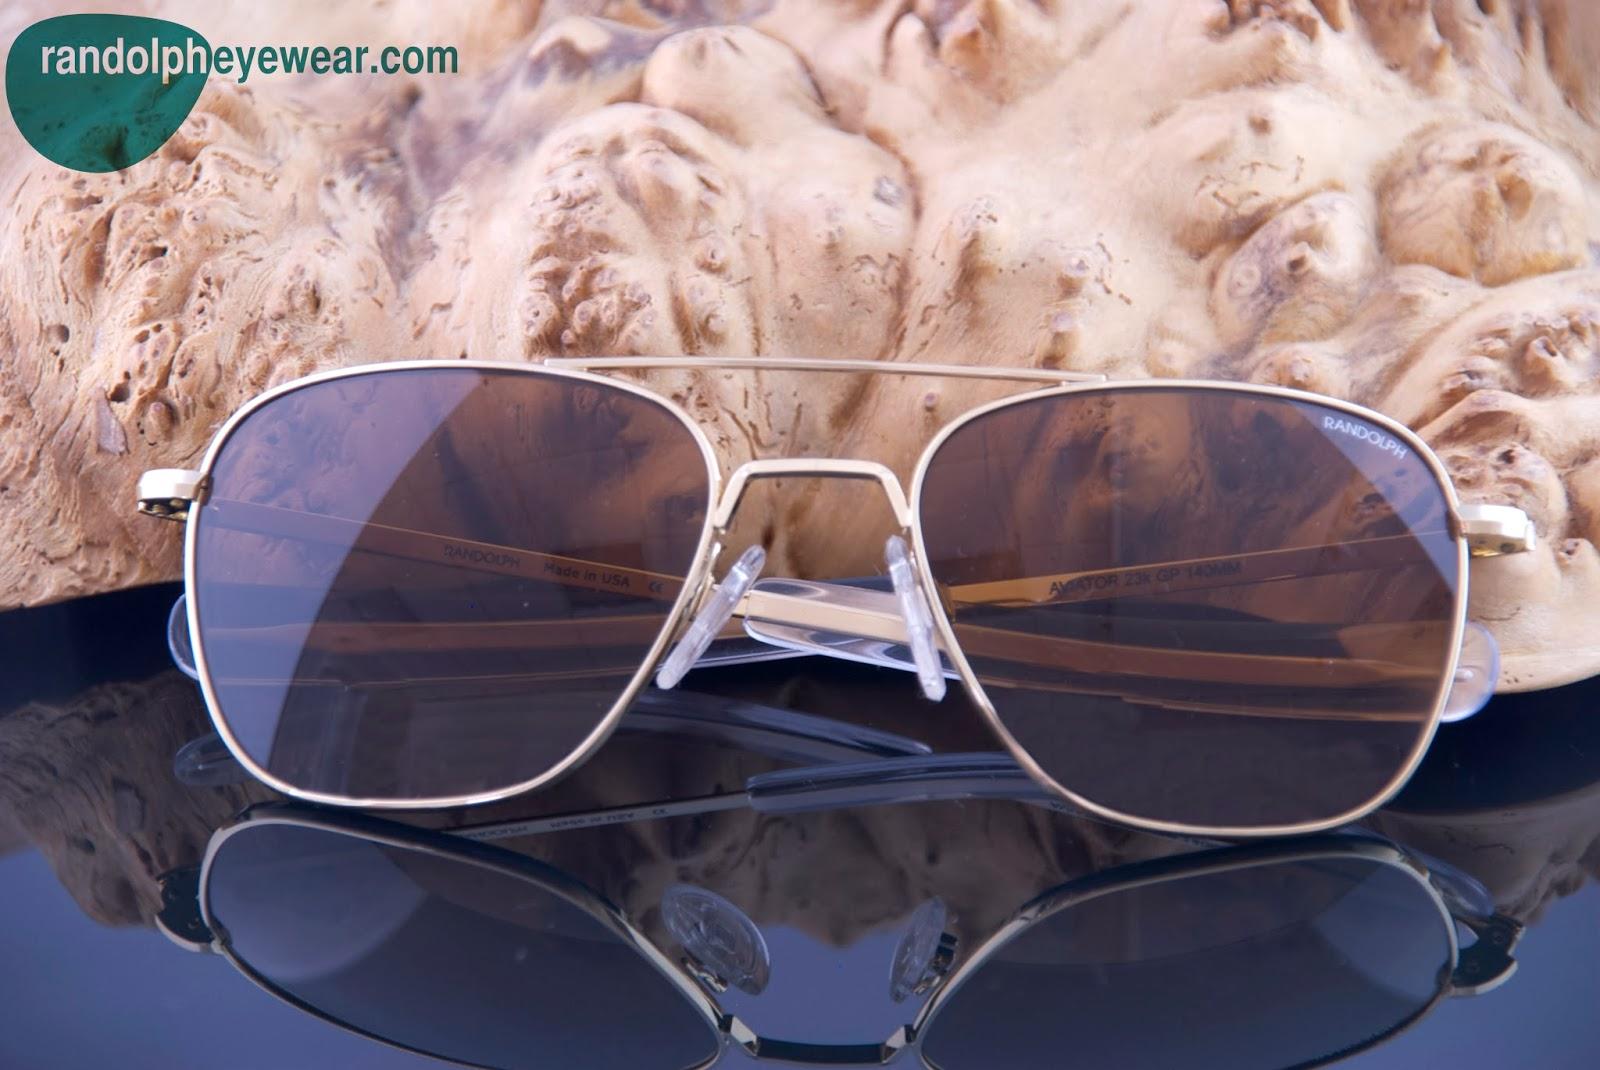 c1ebf1e53add Randolph Eyewear  Randolph makes the Strongest Sunglasses on the Market